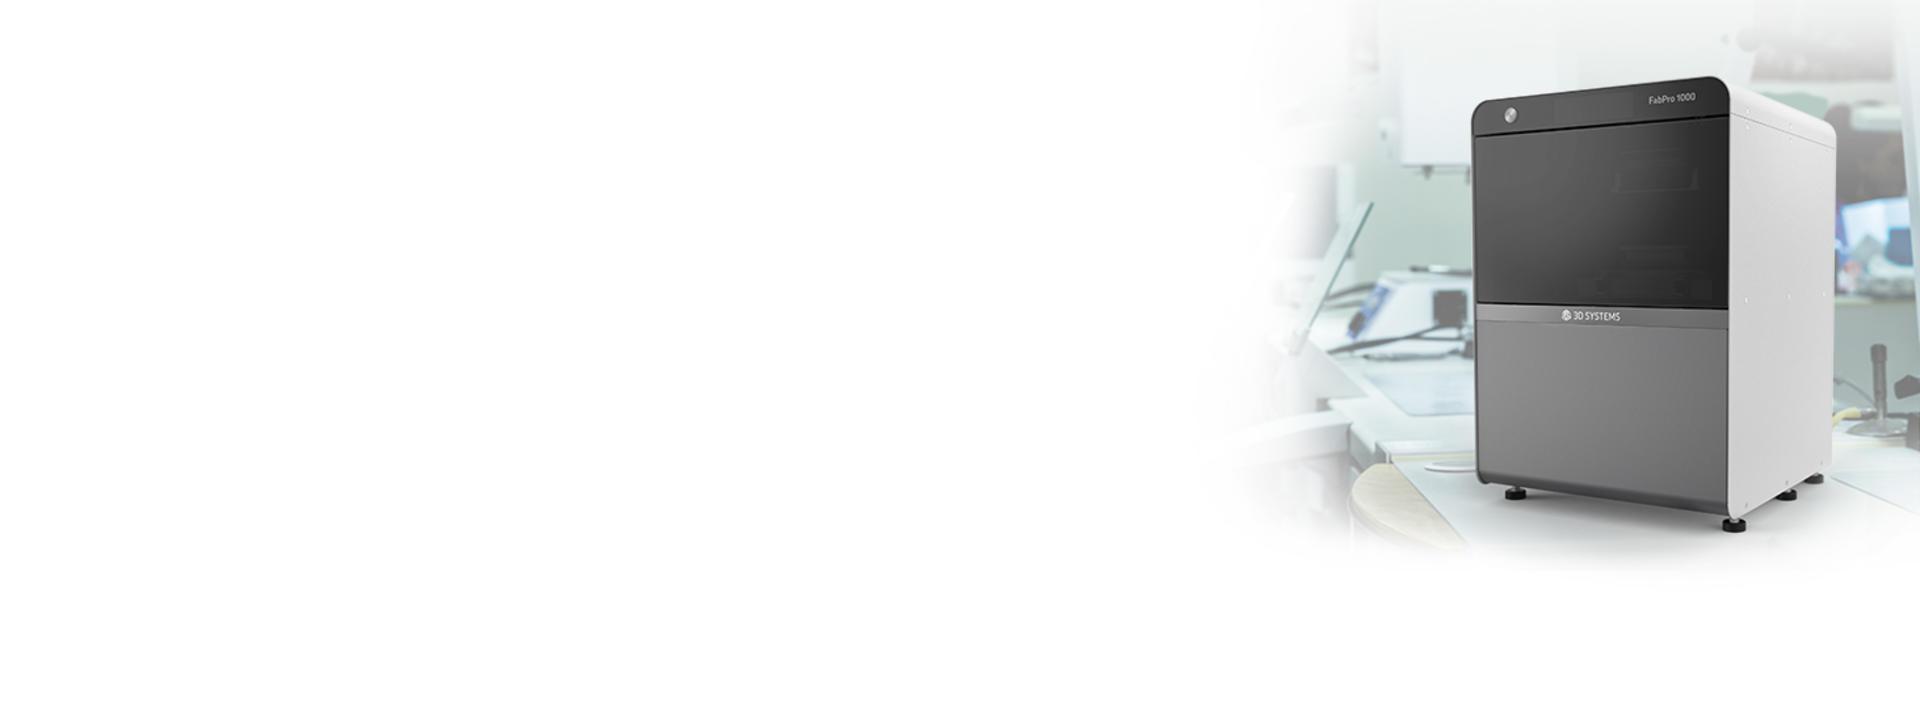 FabPro 1000 for Dental Applications Industry Banner